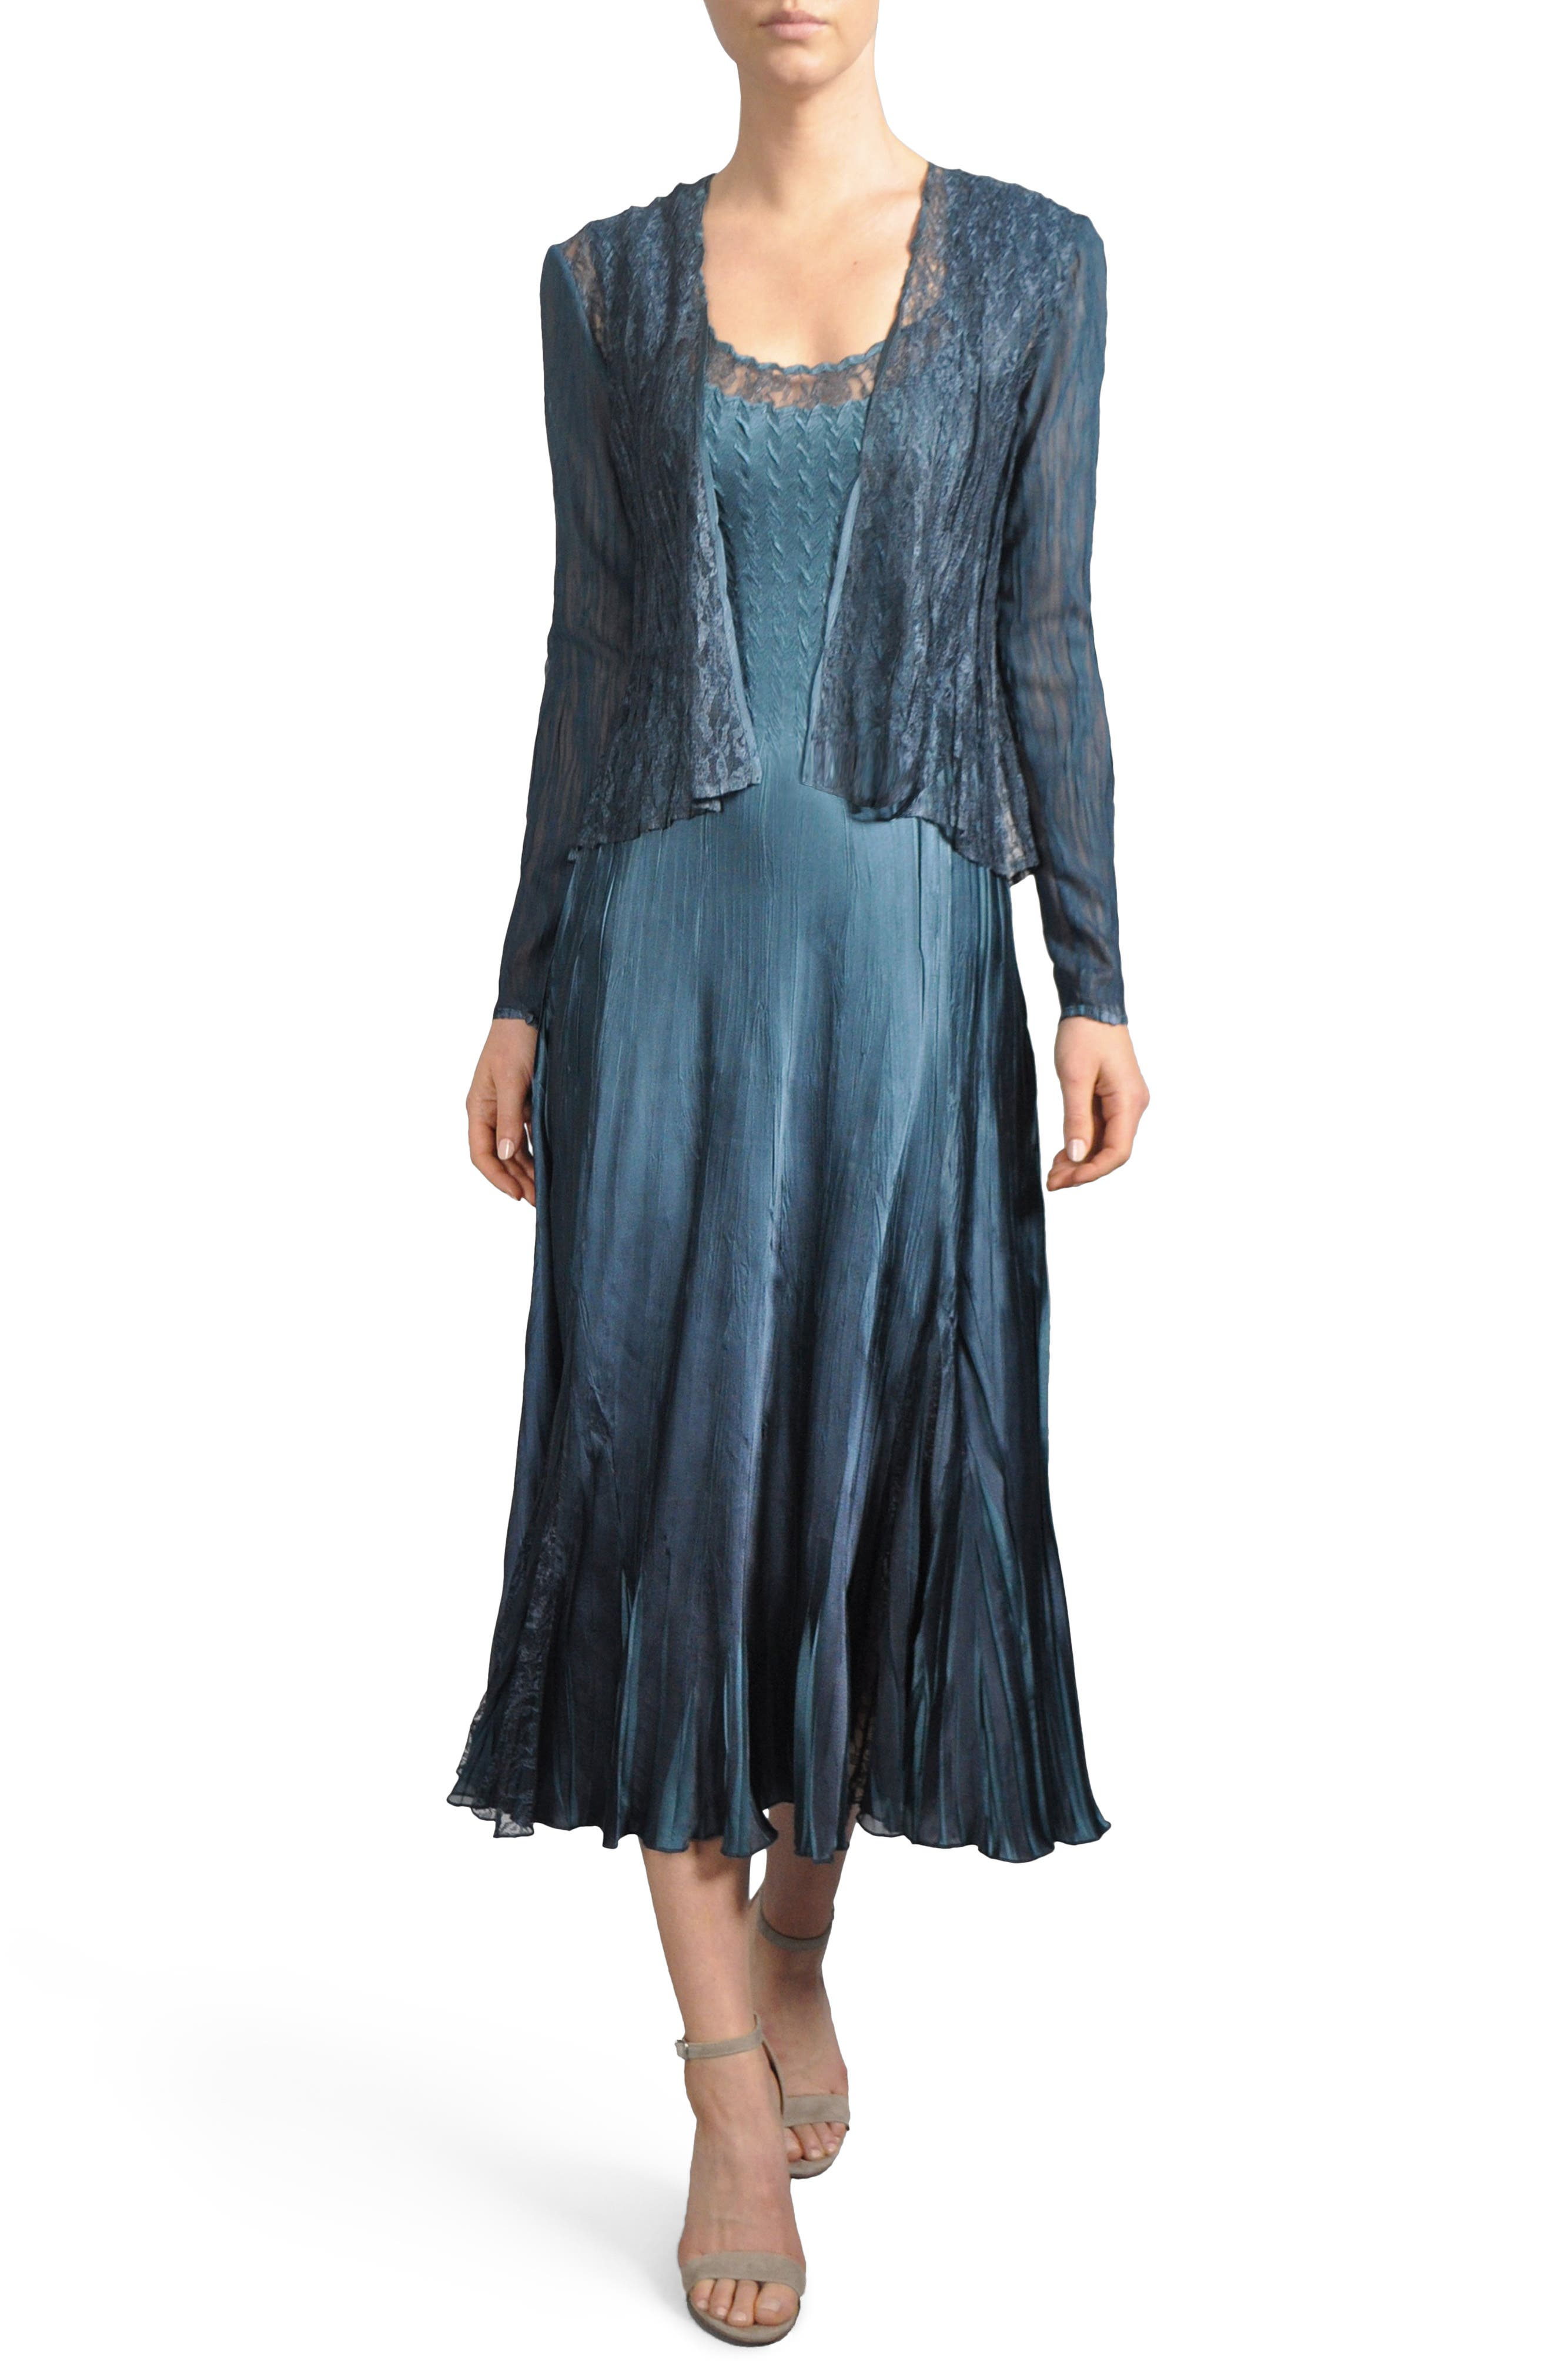 Alternate Image 1 Selected - Komarov Lace Inset Midi Dress with Jacket